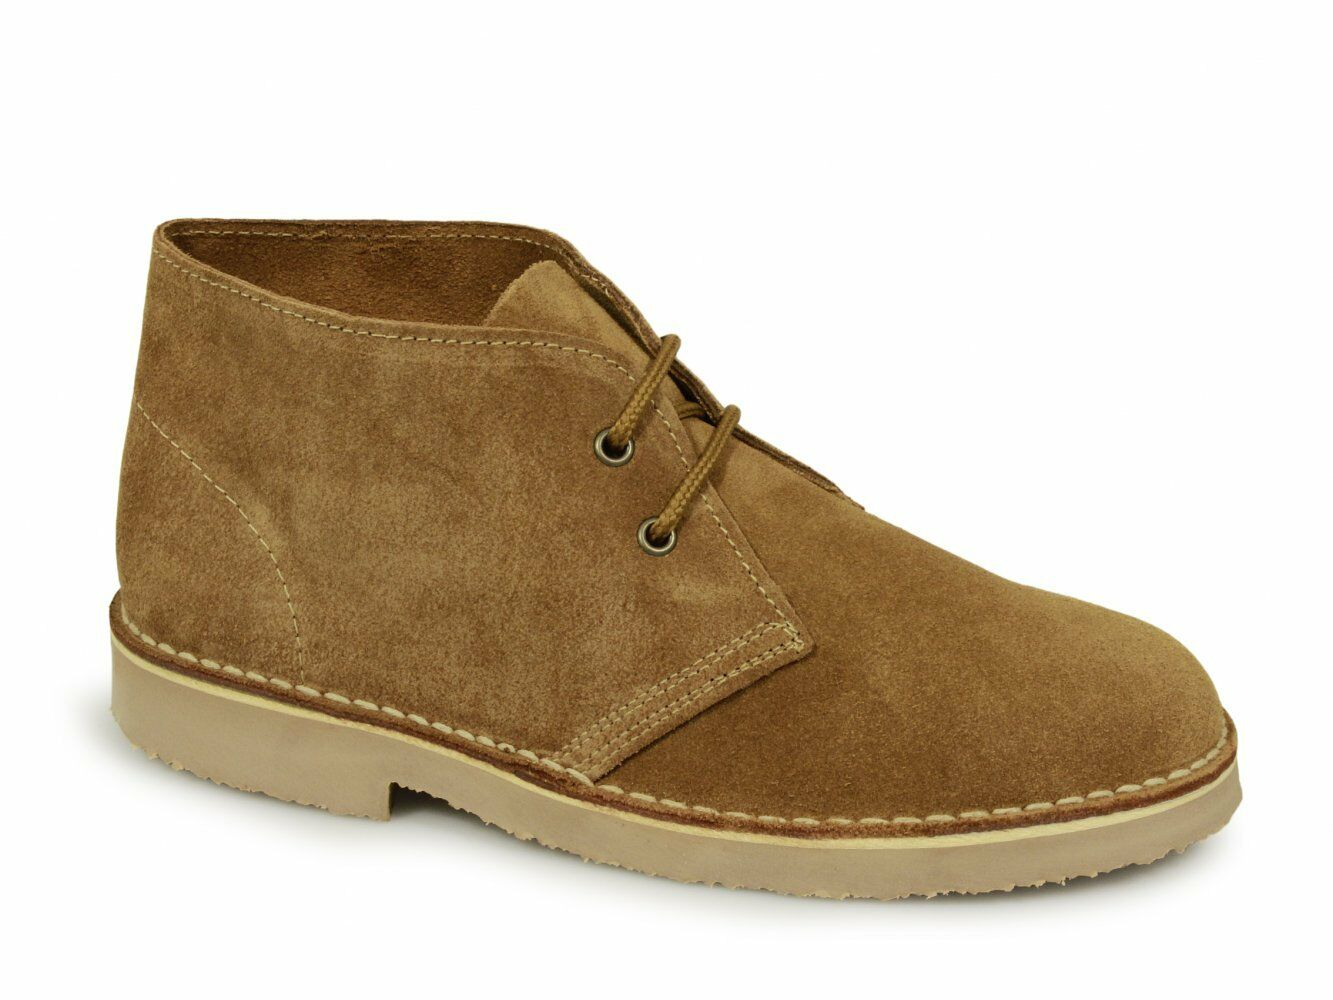 Roamers ORIGINAL Unisex Mens Ladies Soft Suede Leather Lace Up Desert Boots Sand